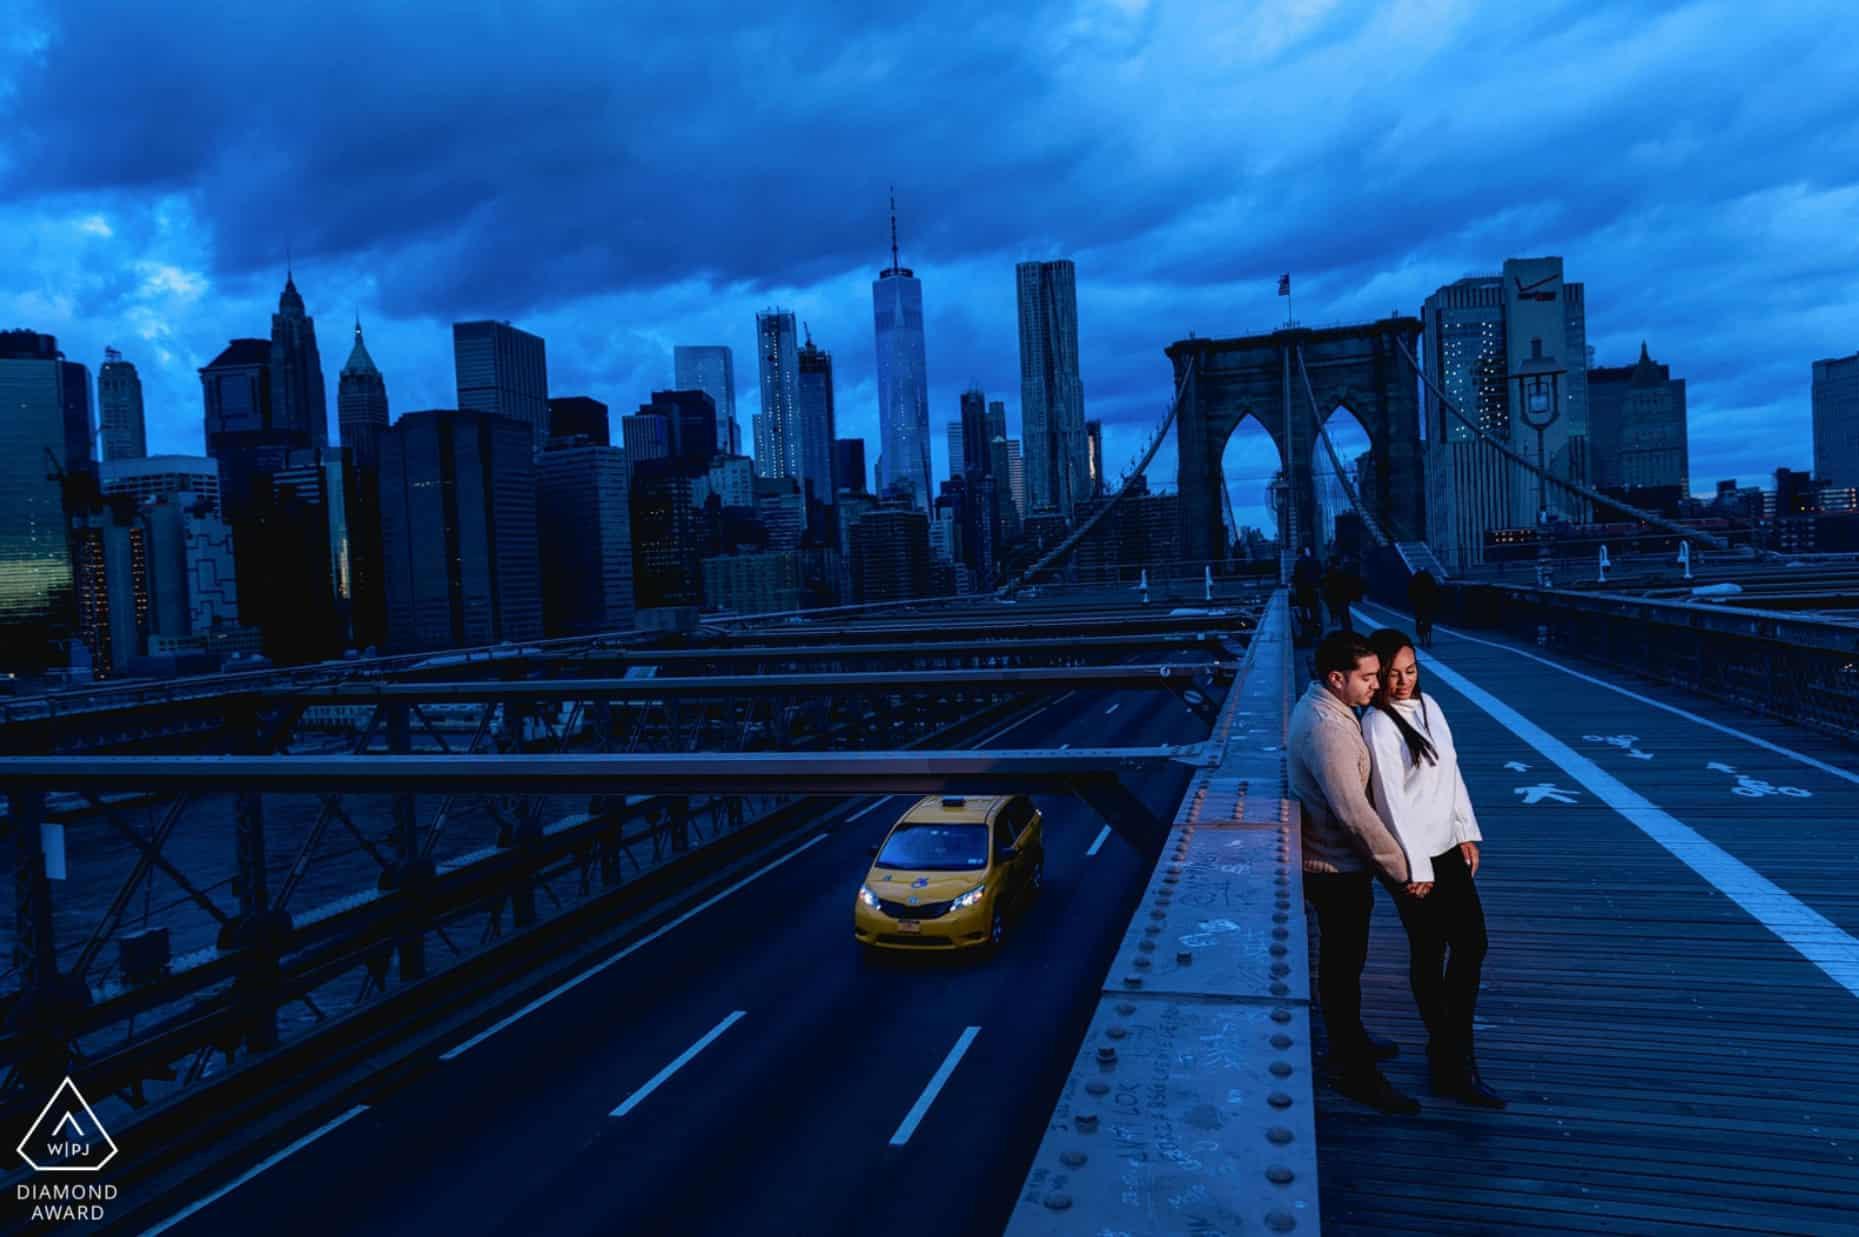 london award winning photography